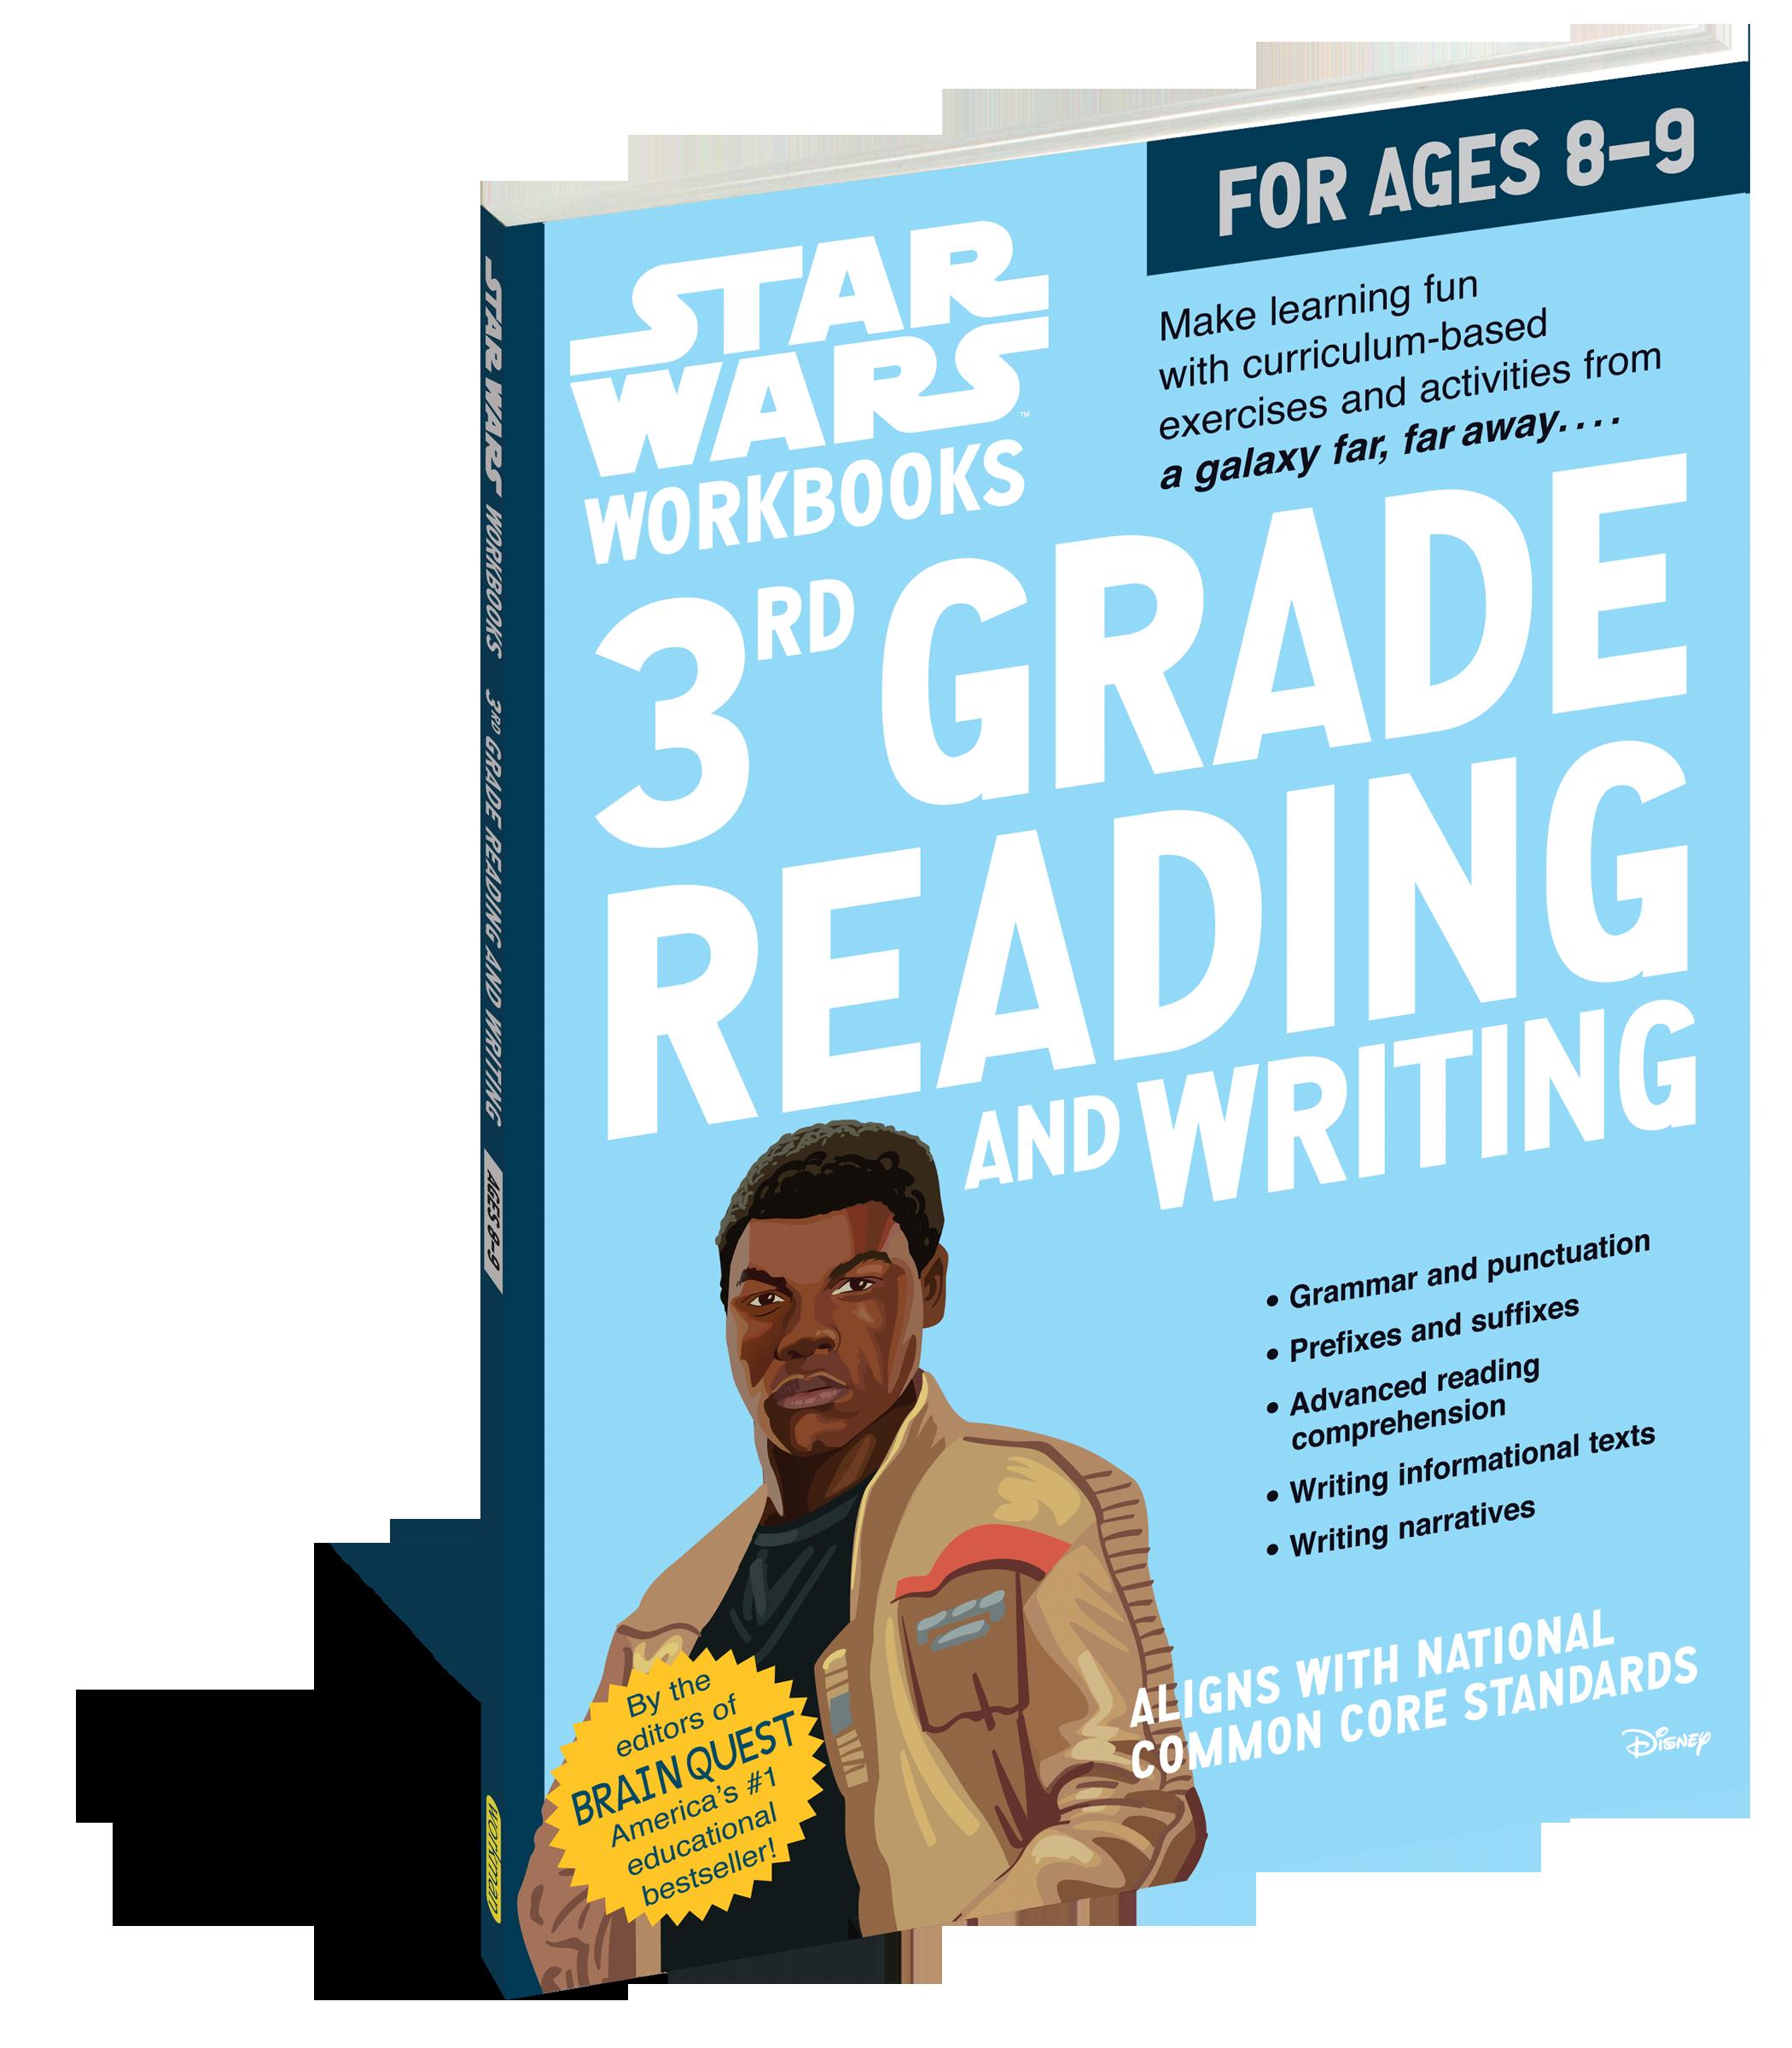 Star Wars Workbook: 3rd Grade Reading and Writing - Workman Publishing